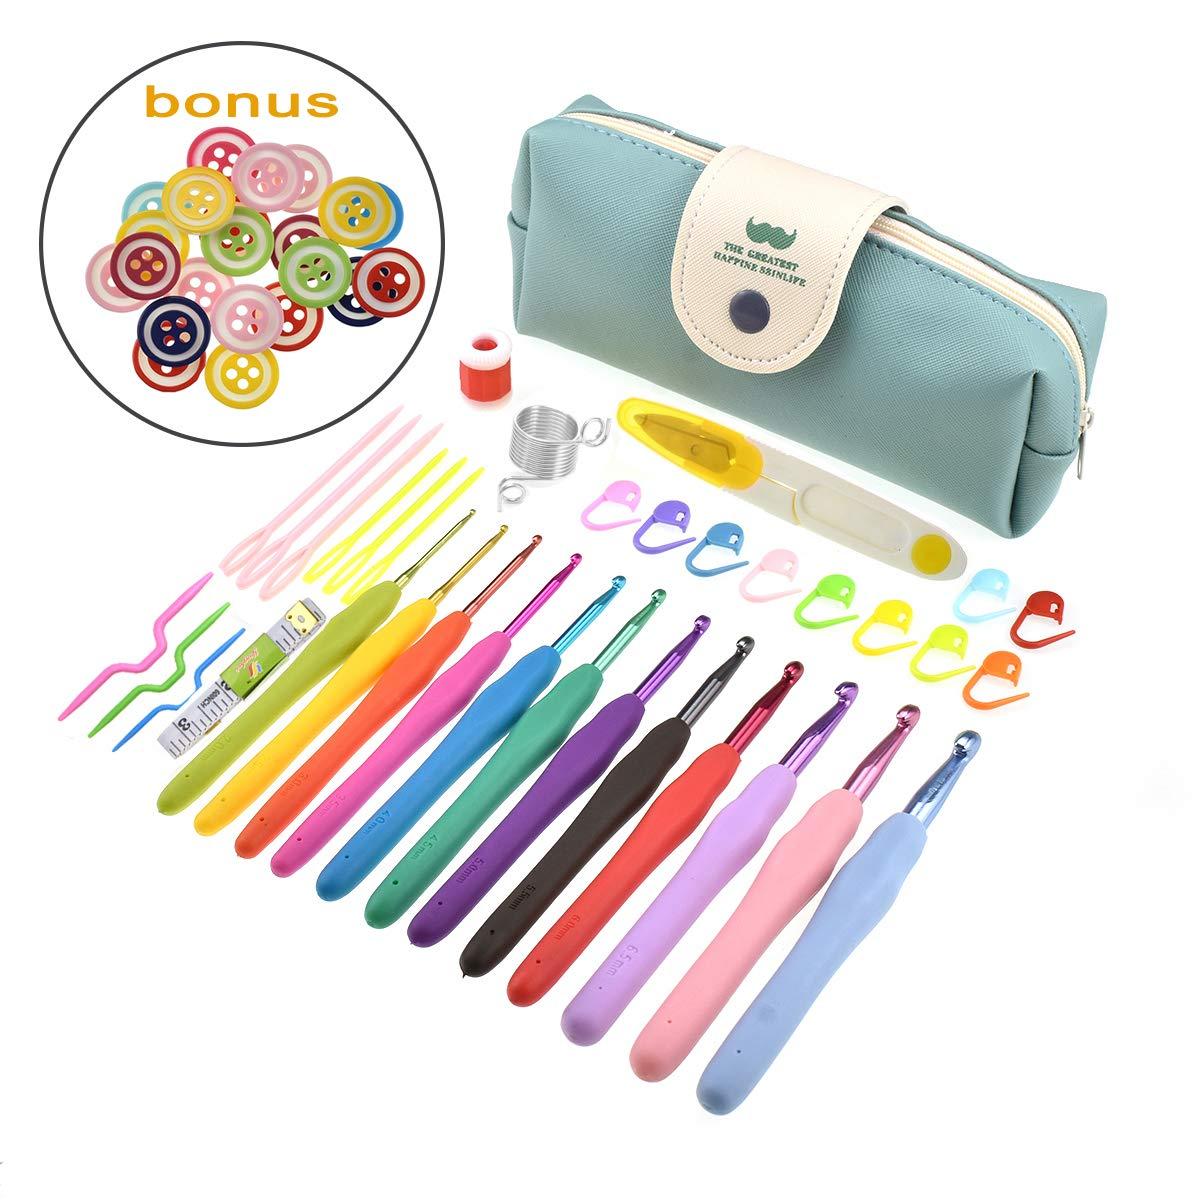 Looen 56 Pack Crochet Kits, 12PCS Colorful Crochet Hooks Set Ergonomic Soft Handles Yarn Knitting Needles for Arthritic Hand Beginner Cute Round Button w/Full Accessories (Colorful Hooks Set)